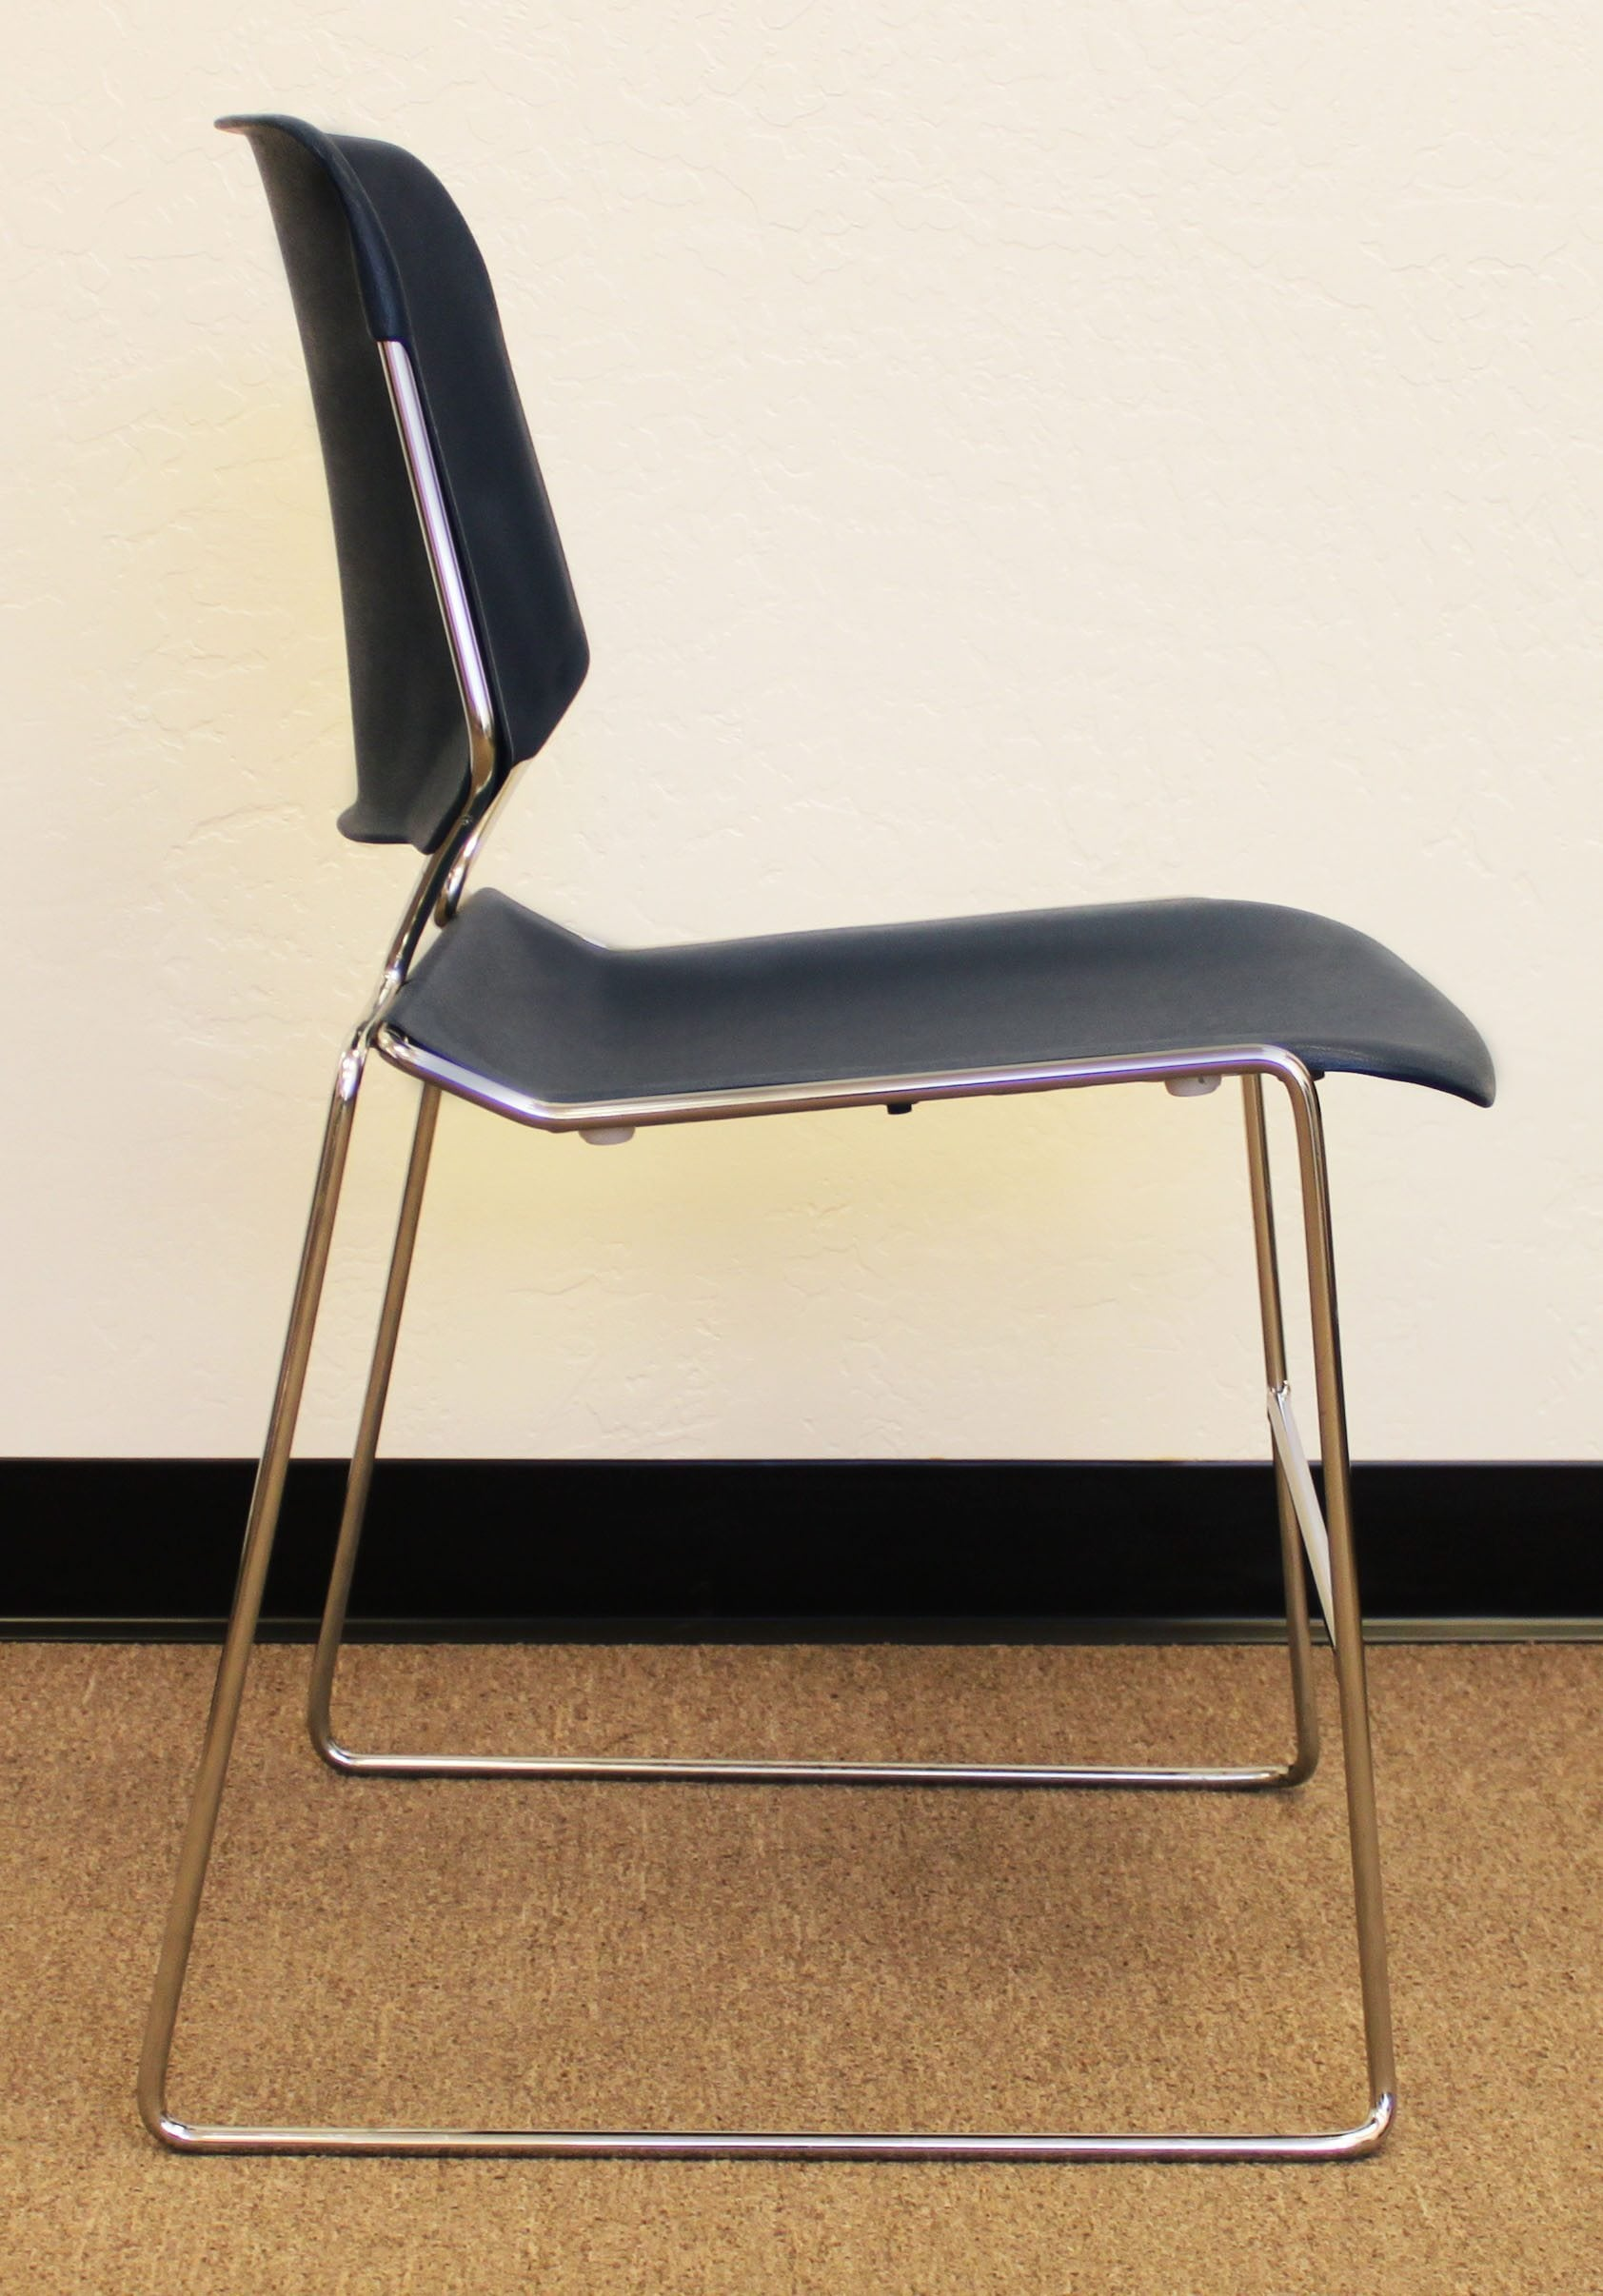 krueger folding chairs fishing chair korum matrix used stack blue national office